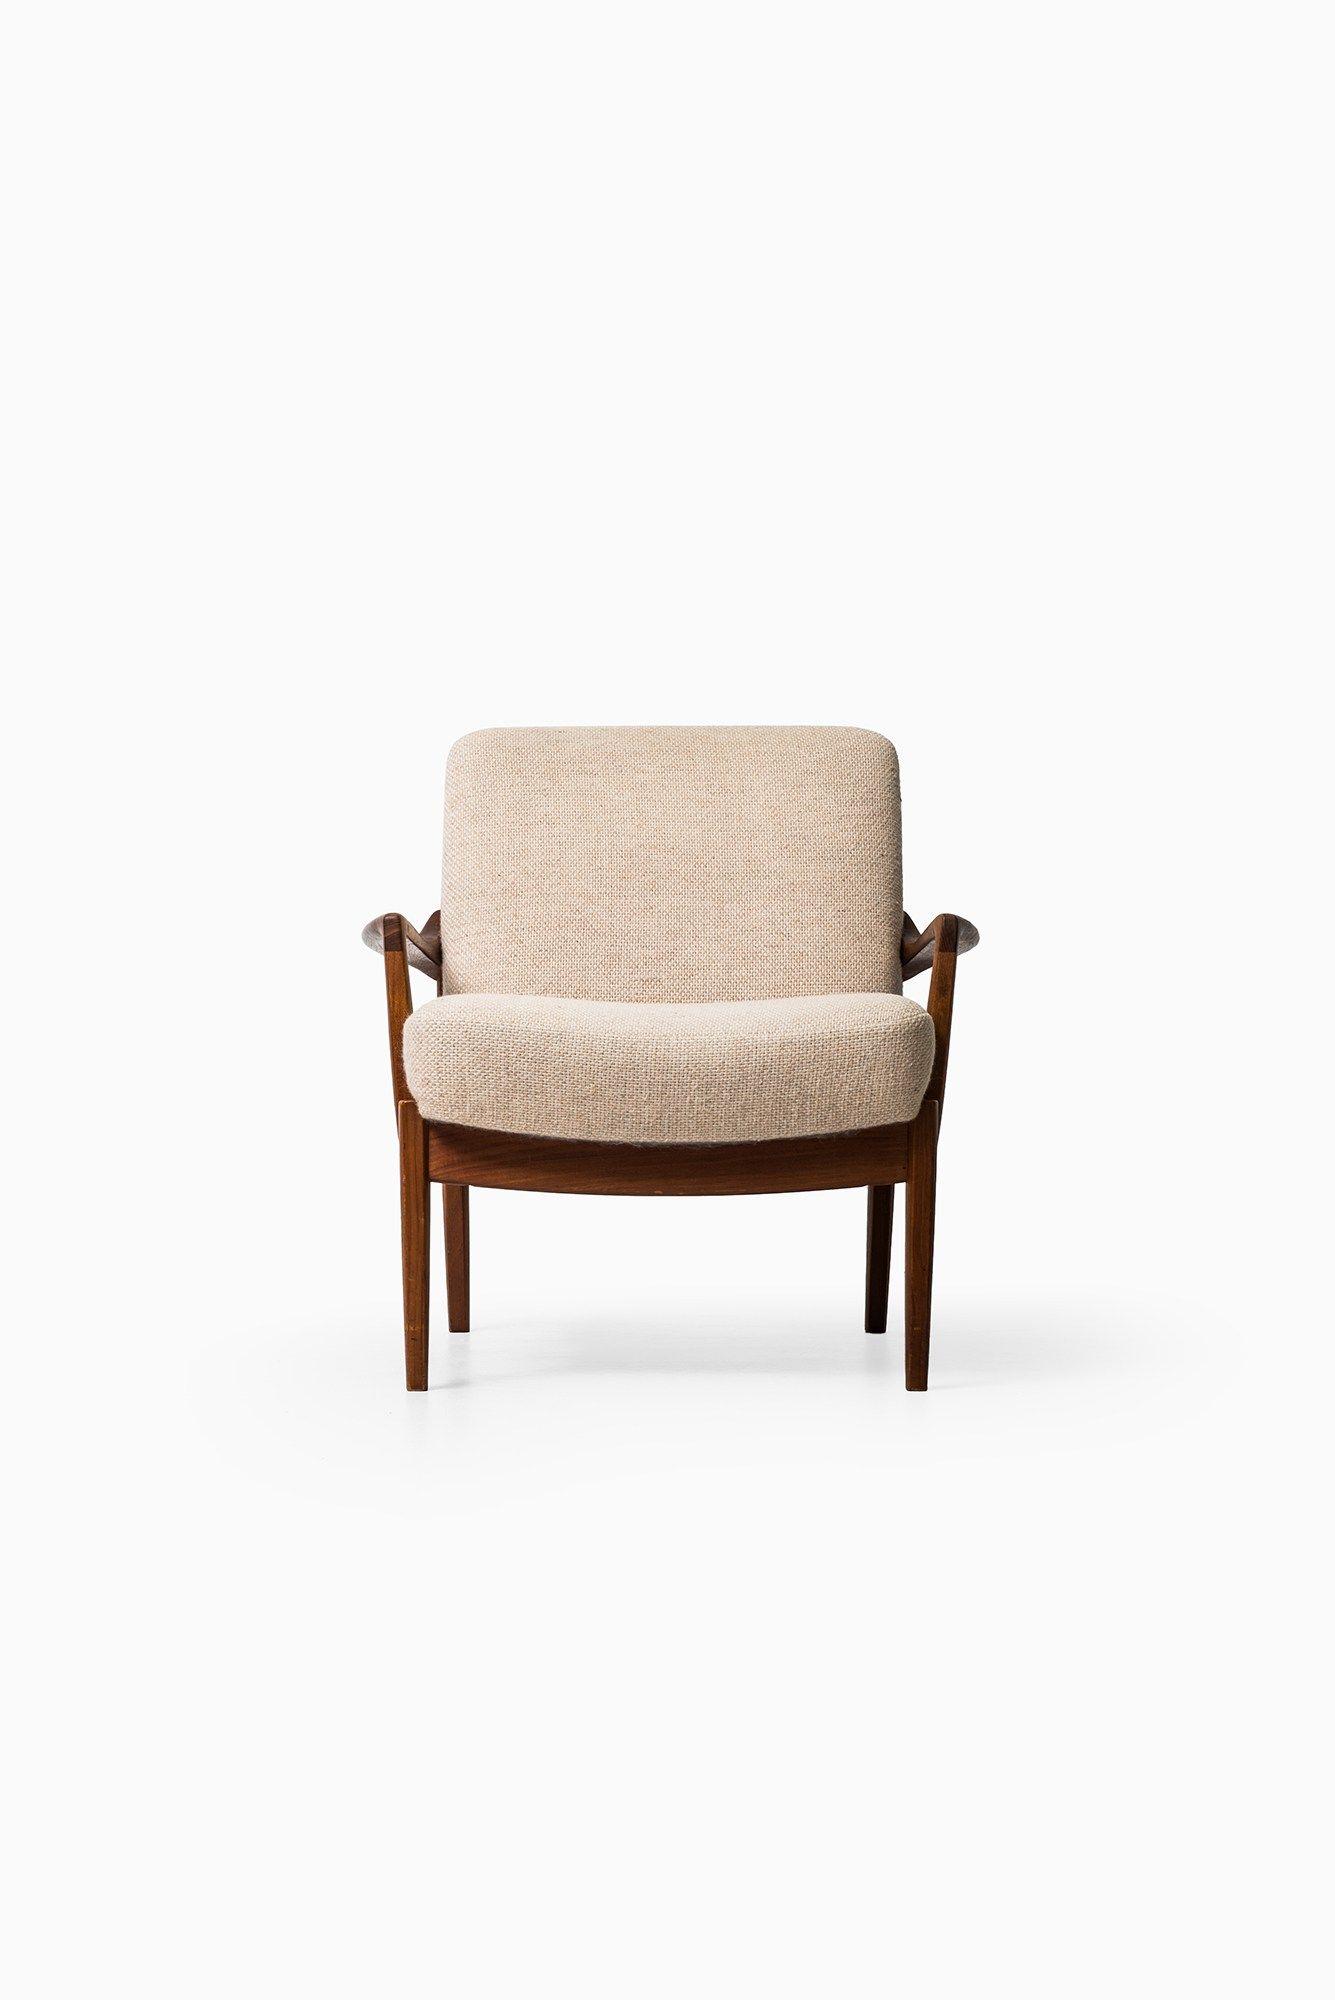 Tove Edvard Kindt Larsen Easy Chair At Studio Schalling  # Muebles Power G